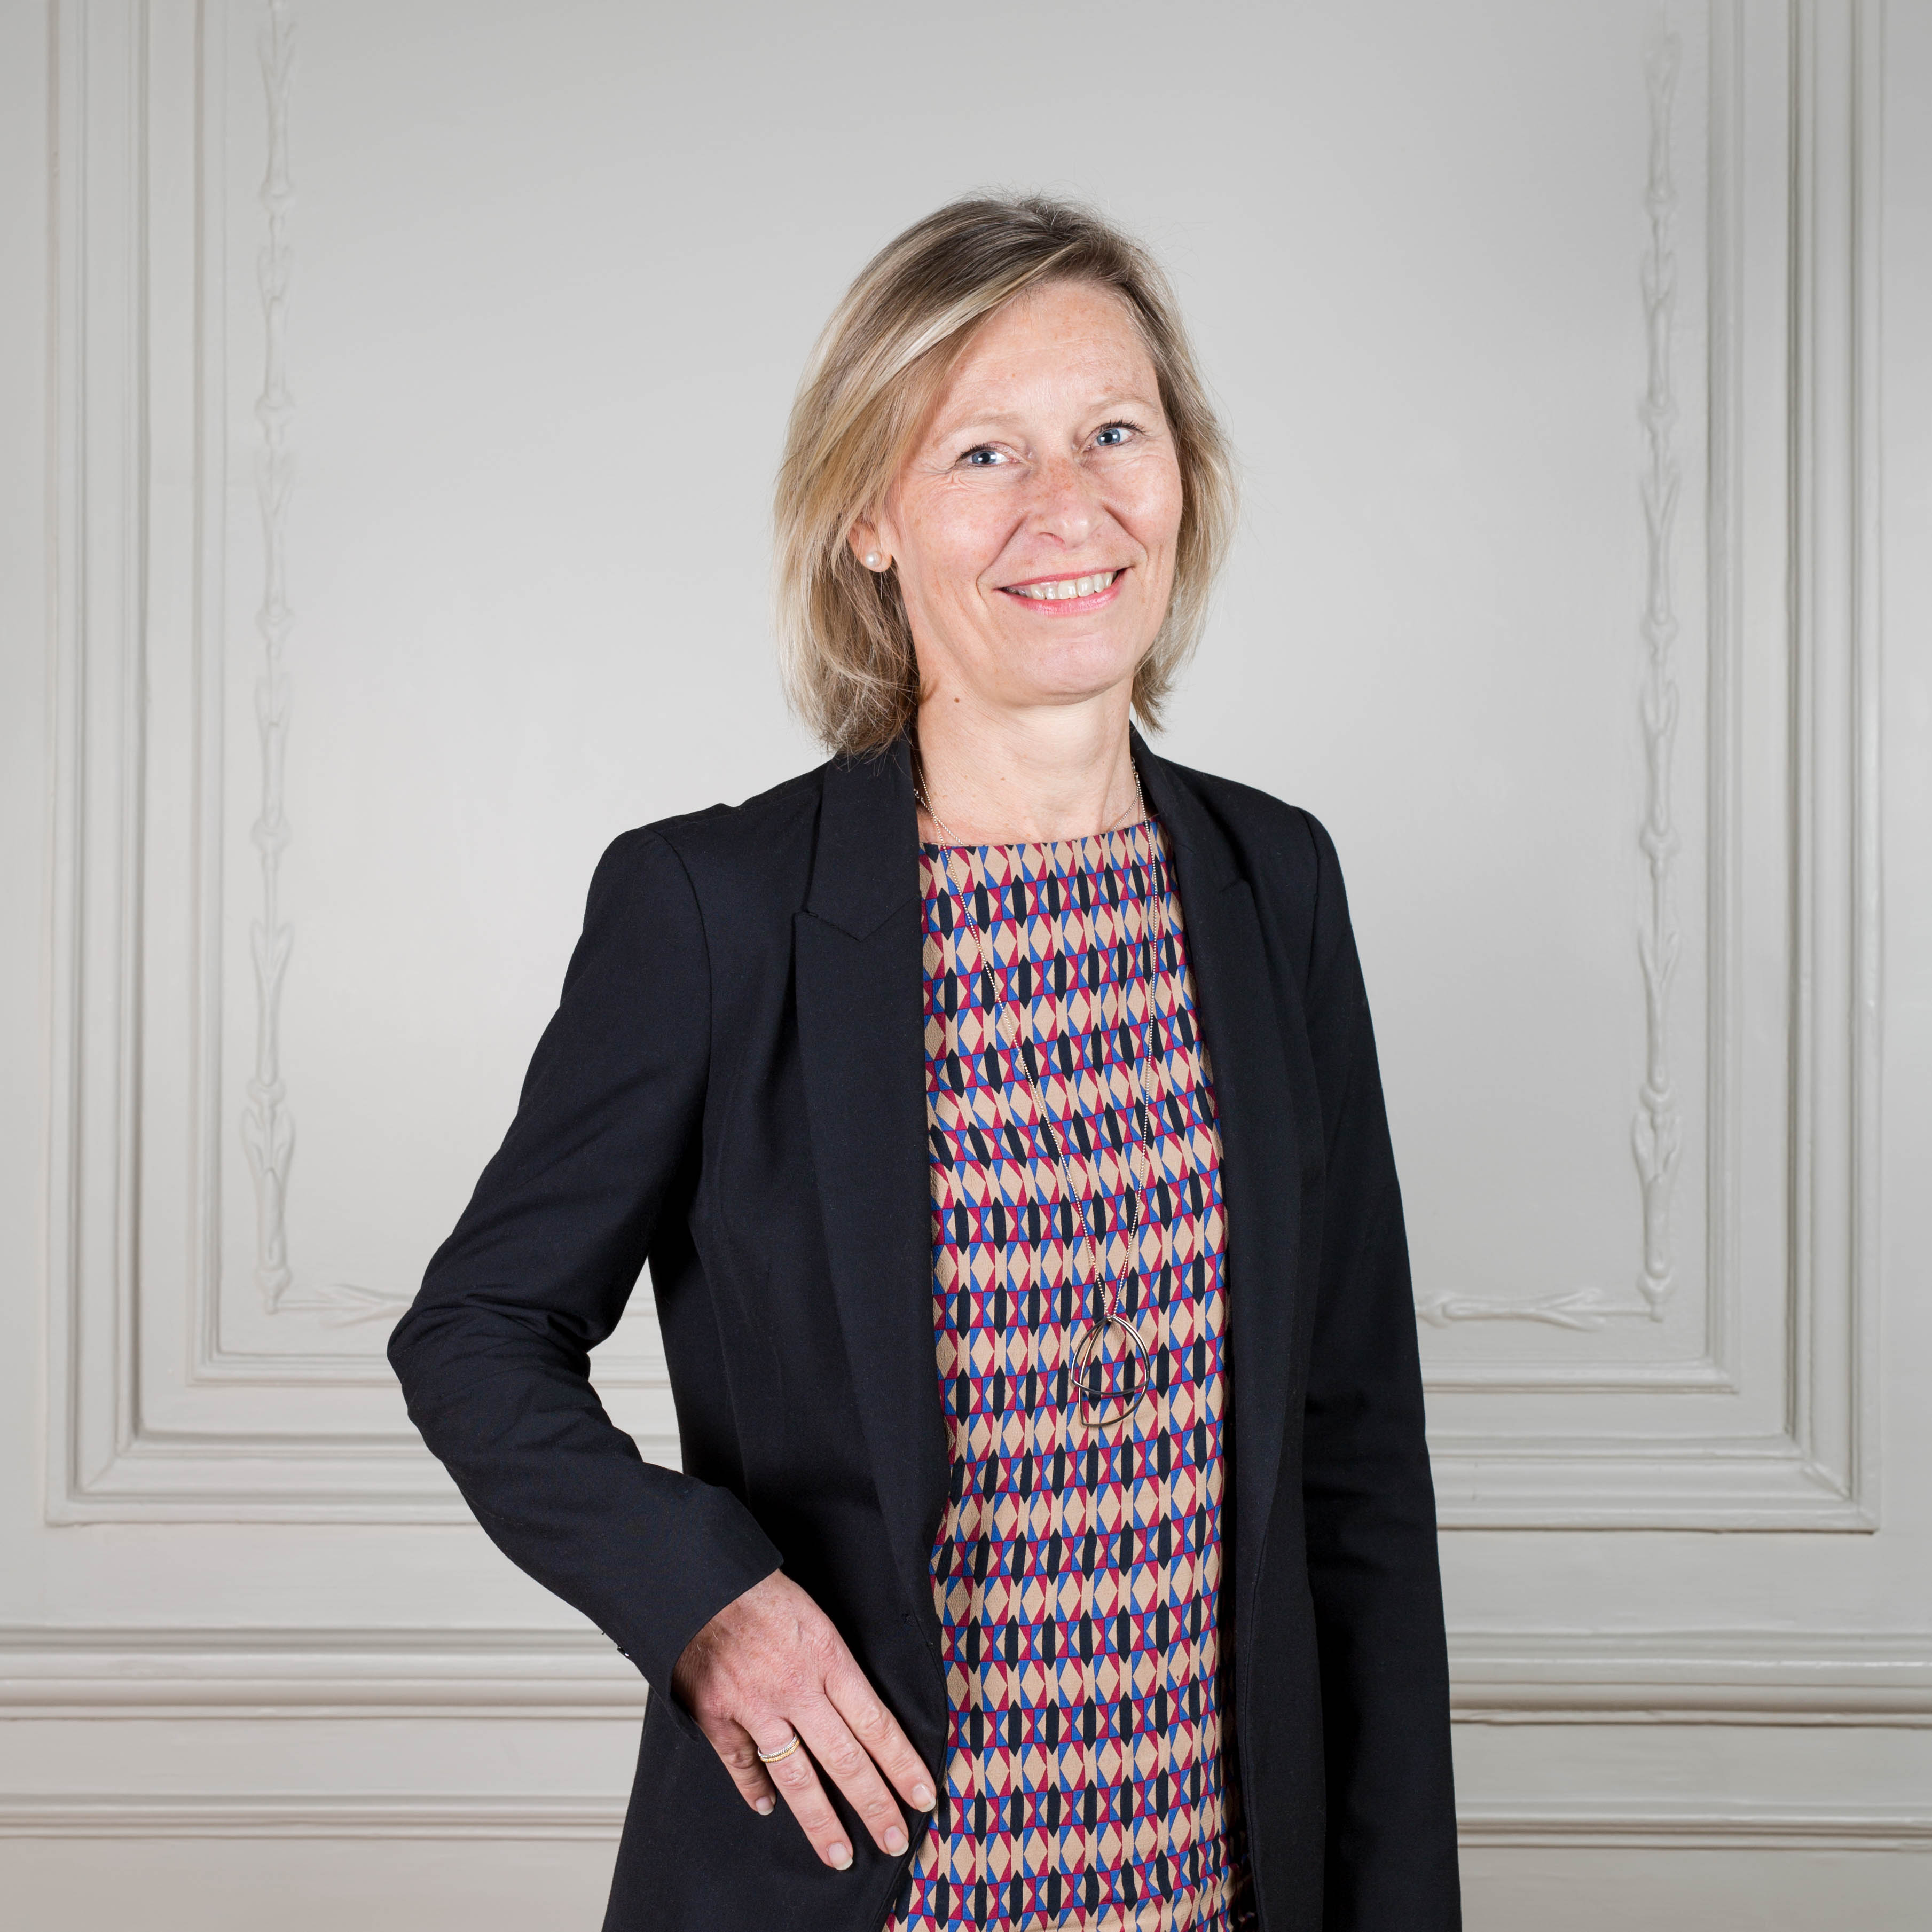 Susanne Schmidt-Alric